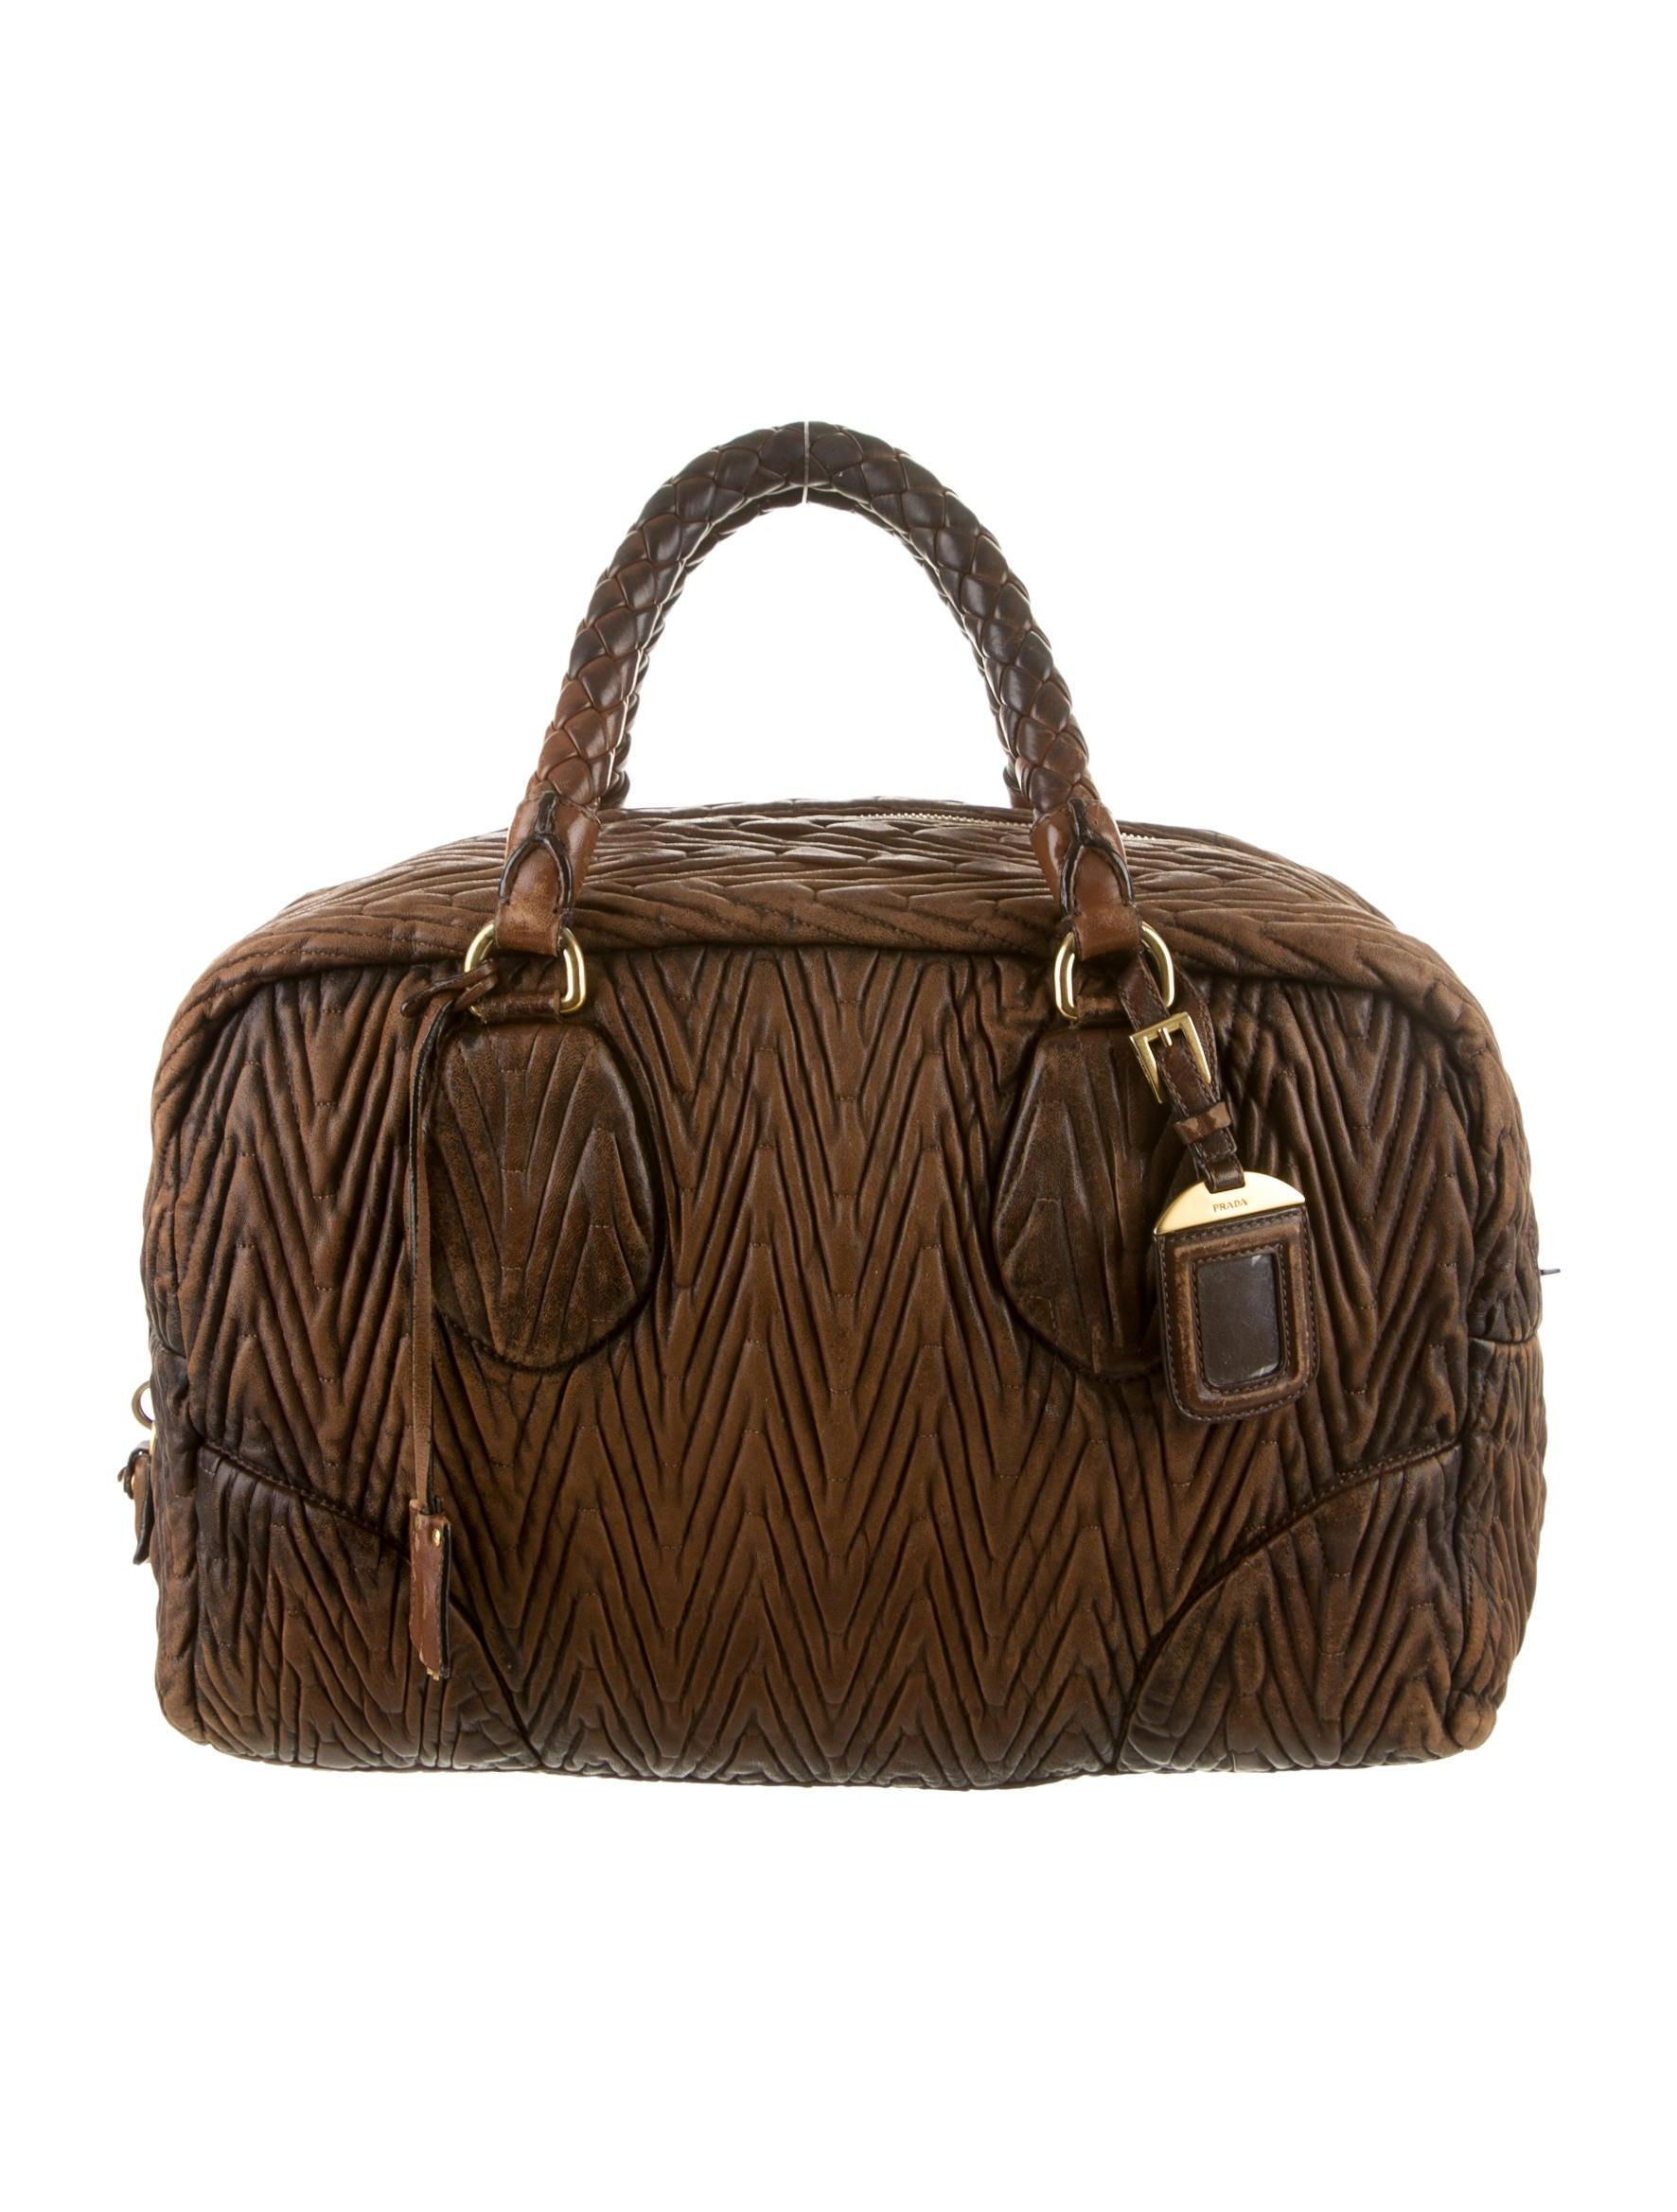 prada brown leather wallet - Prada Nappa Antic Bauletto Bag - Handbags - PRA71174   The RealReal